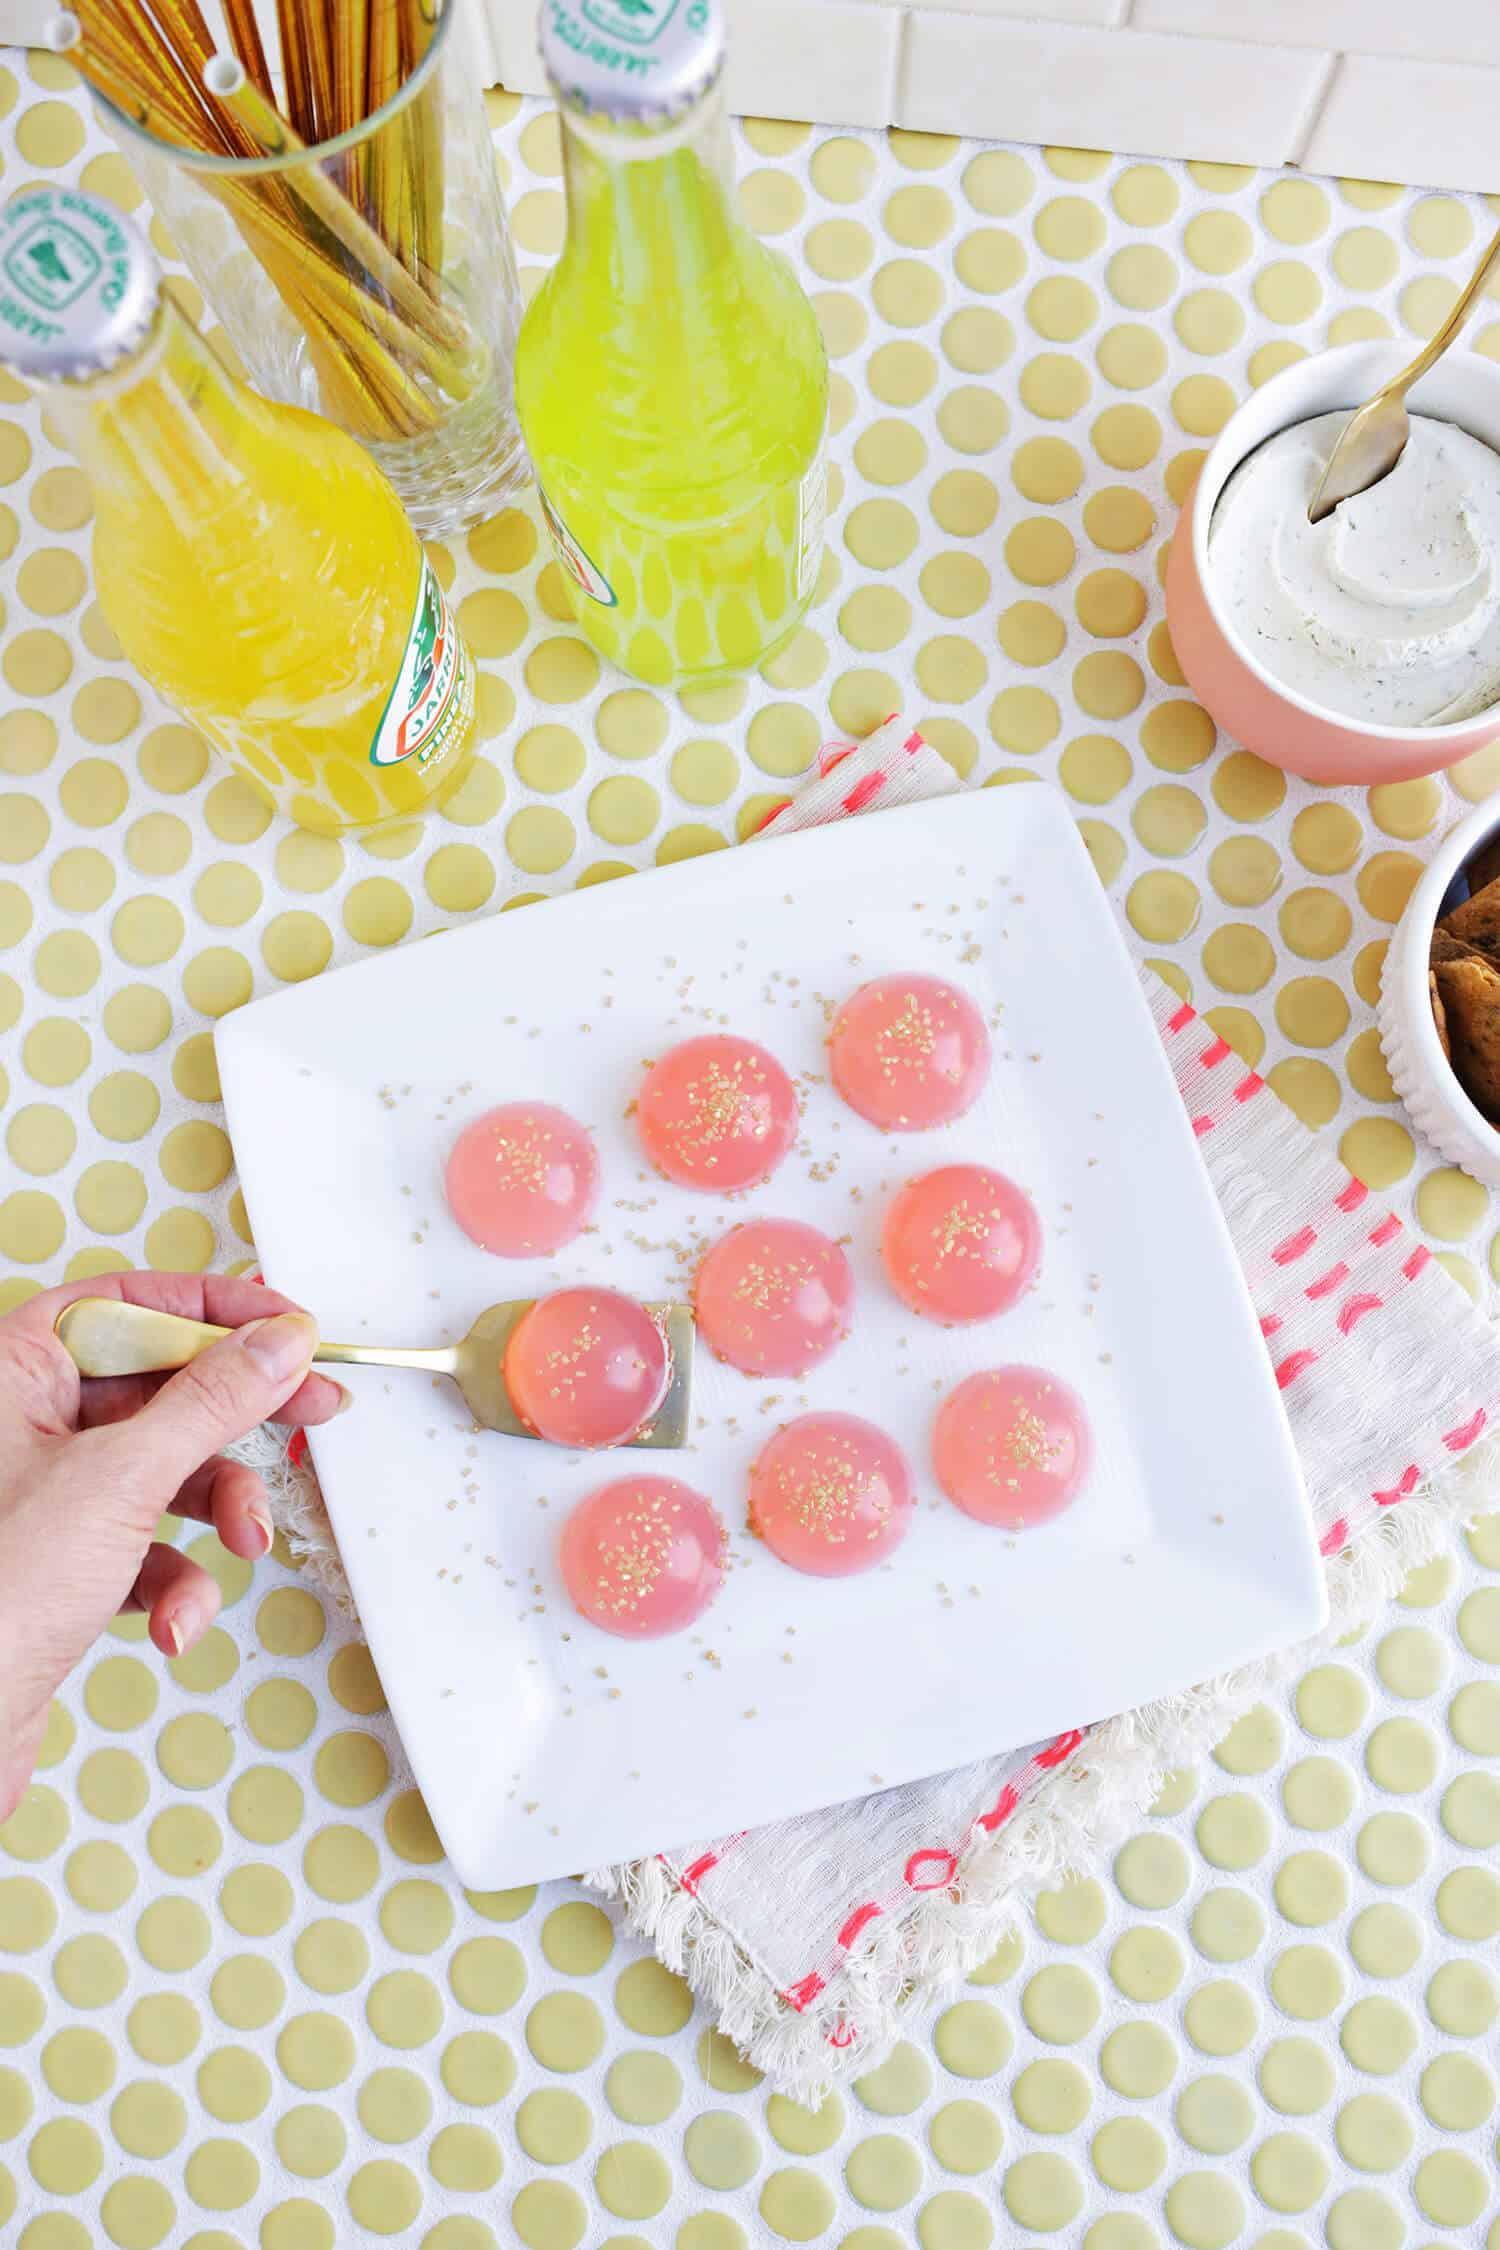 Best ideas about Birthday Cake Jello Shots . Save or Pin Birthday Cake Jello Shots A Beautiful Mess Now.